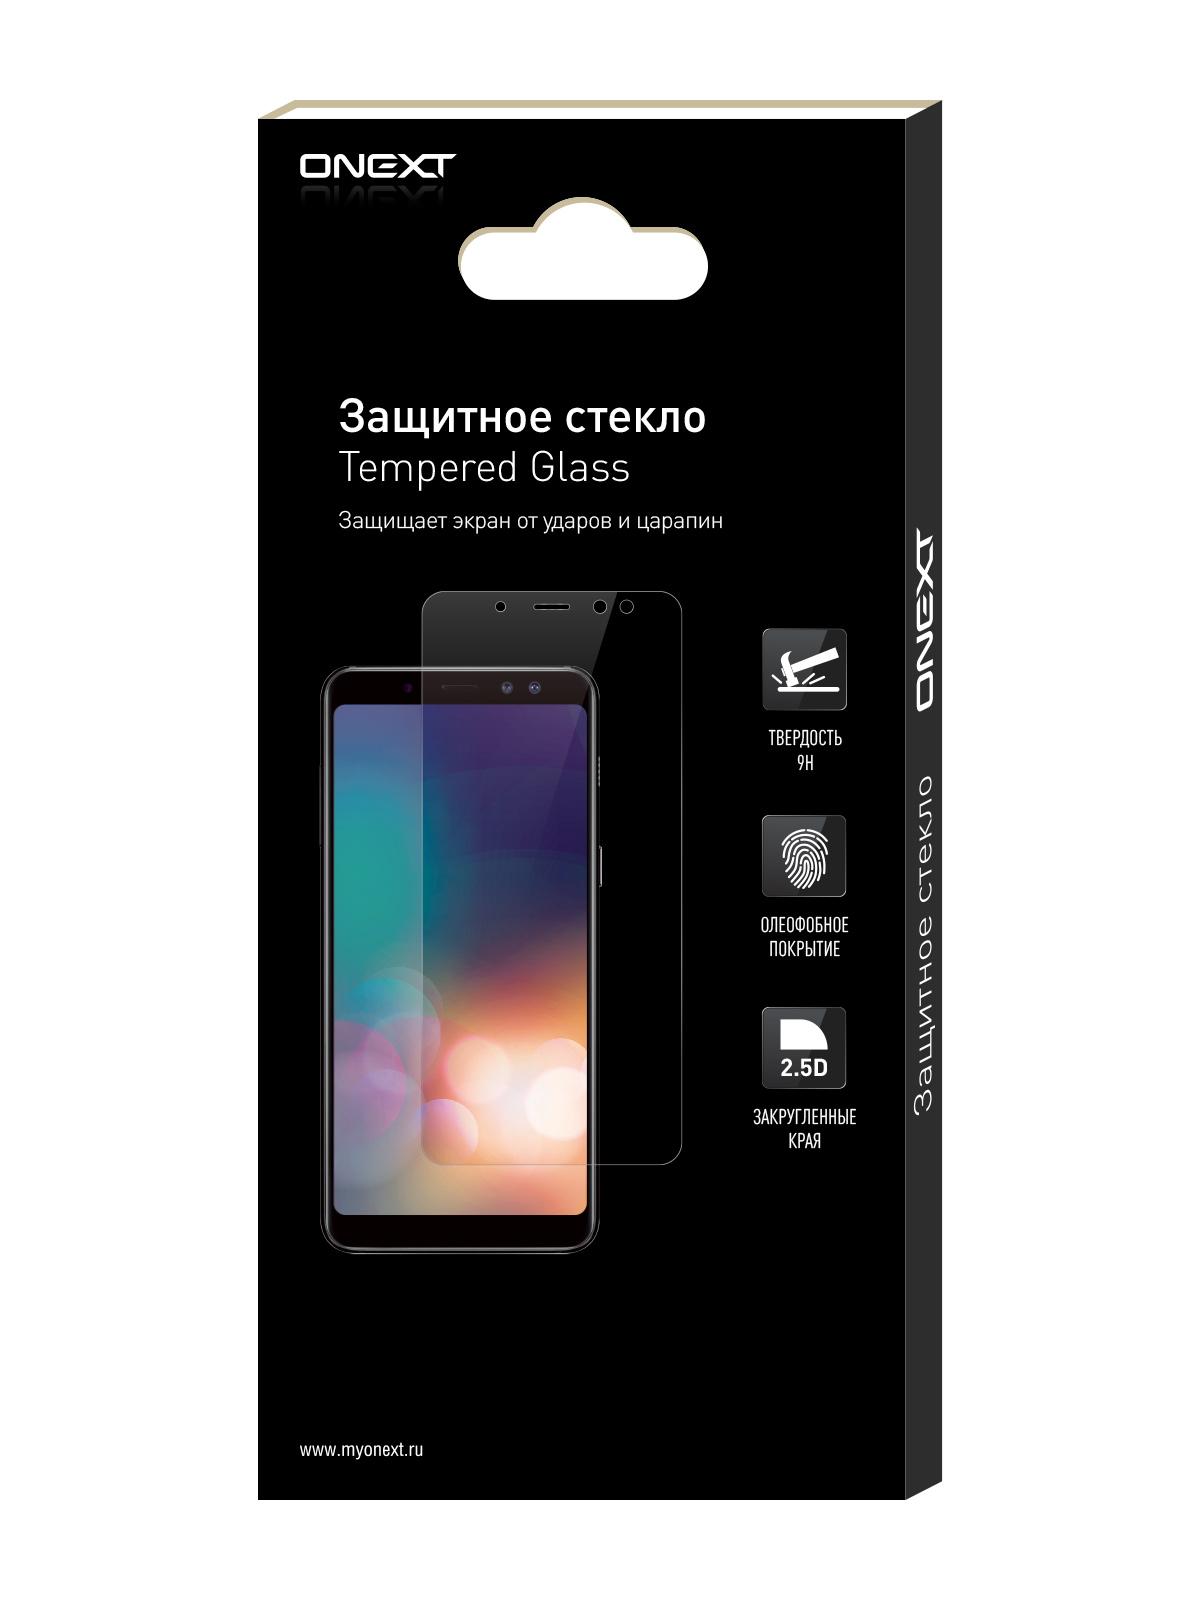 Защитное стекло ONEXT HTC One mini 2 поворот экрана htc